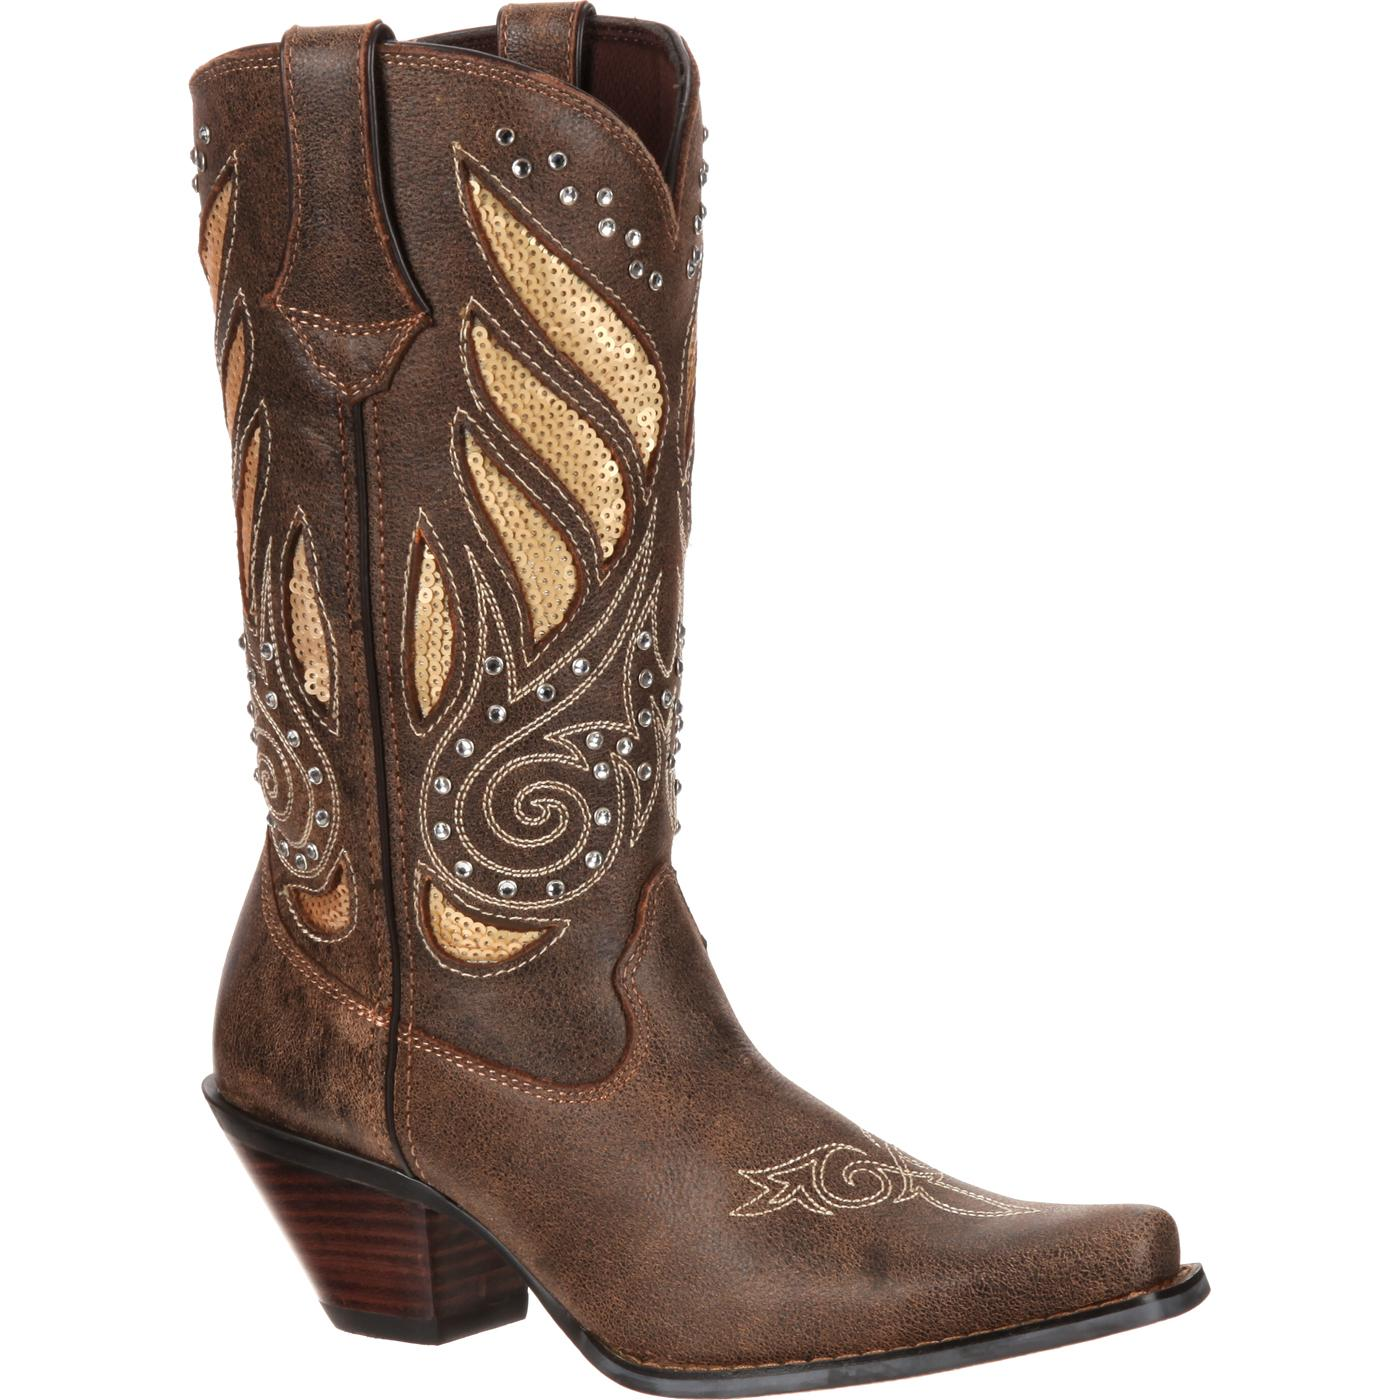 Crush by Durango Women's Bling Western Boot, #RD003